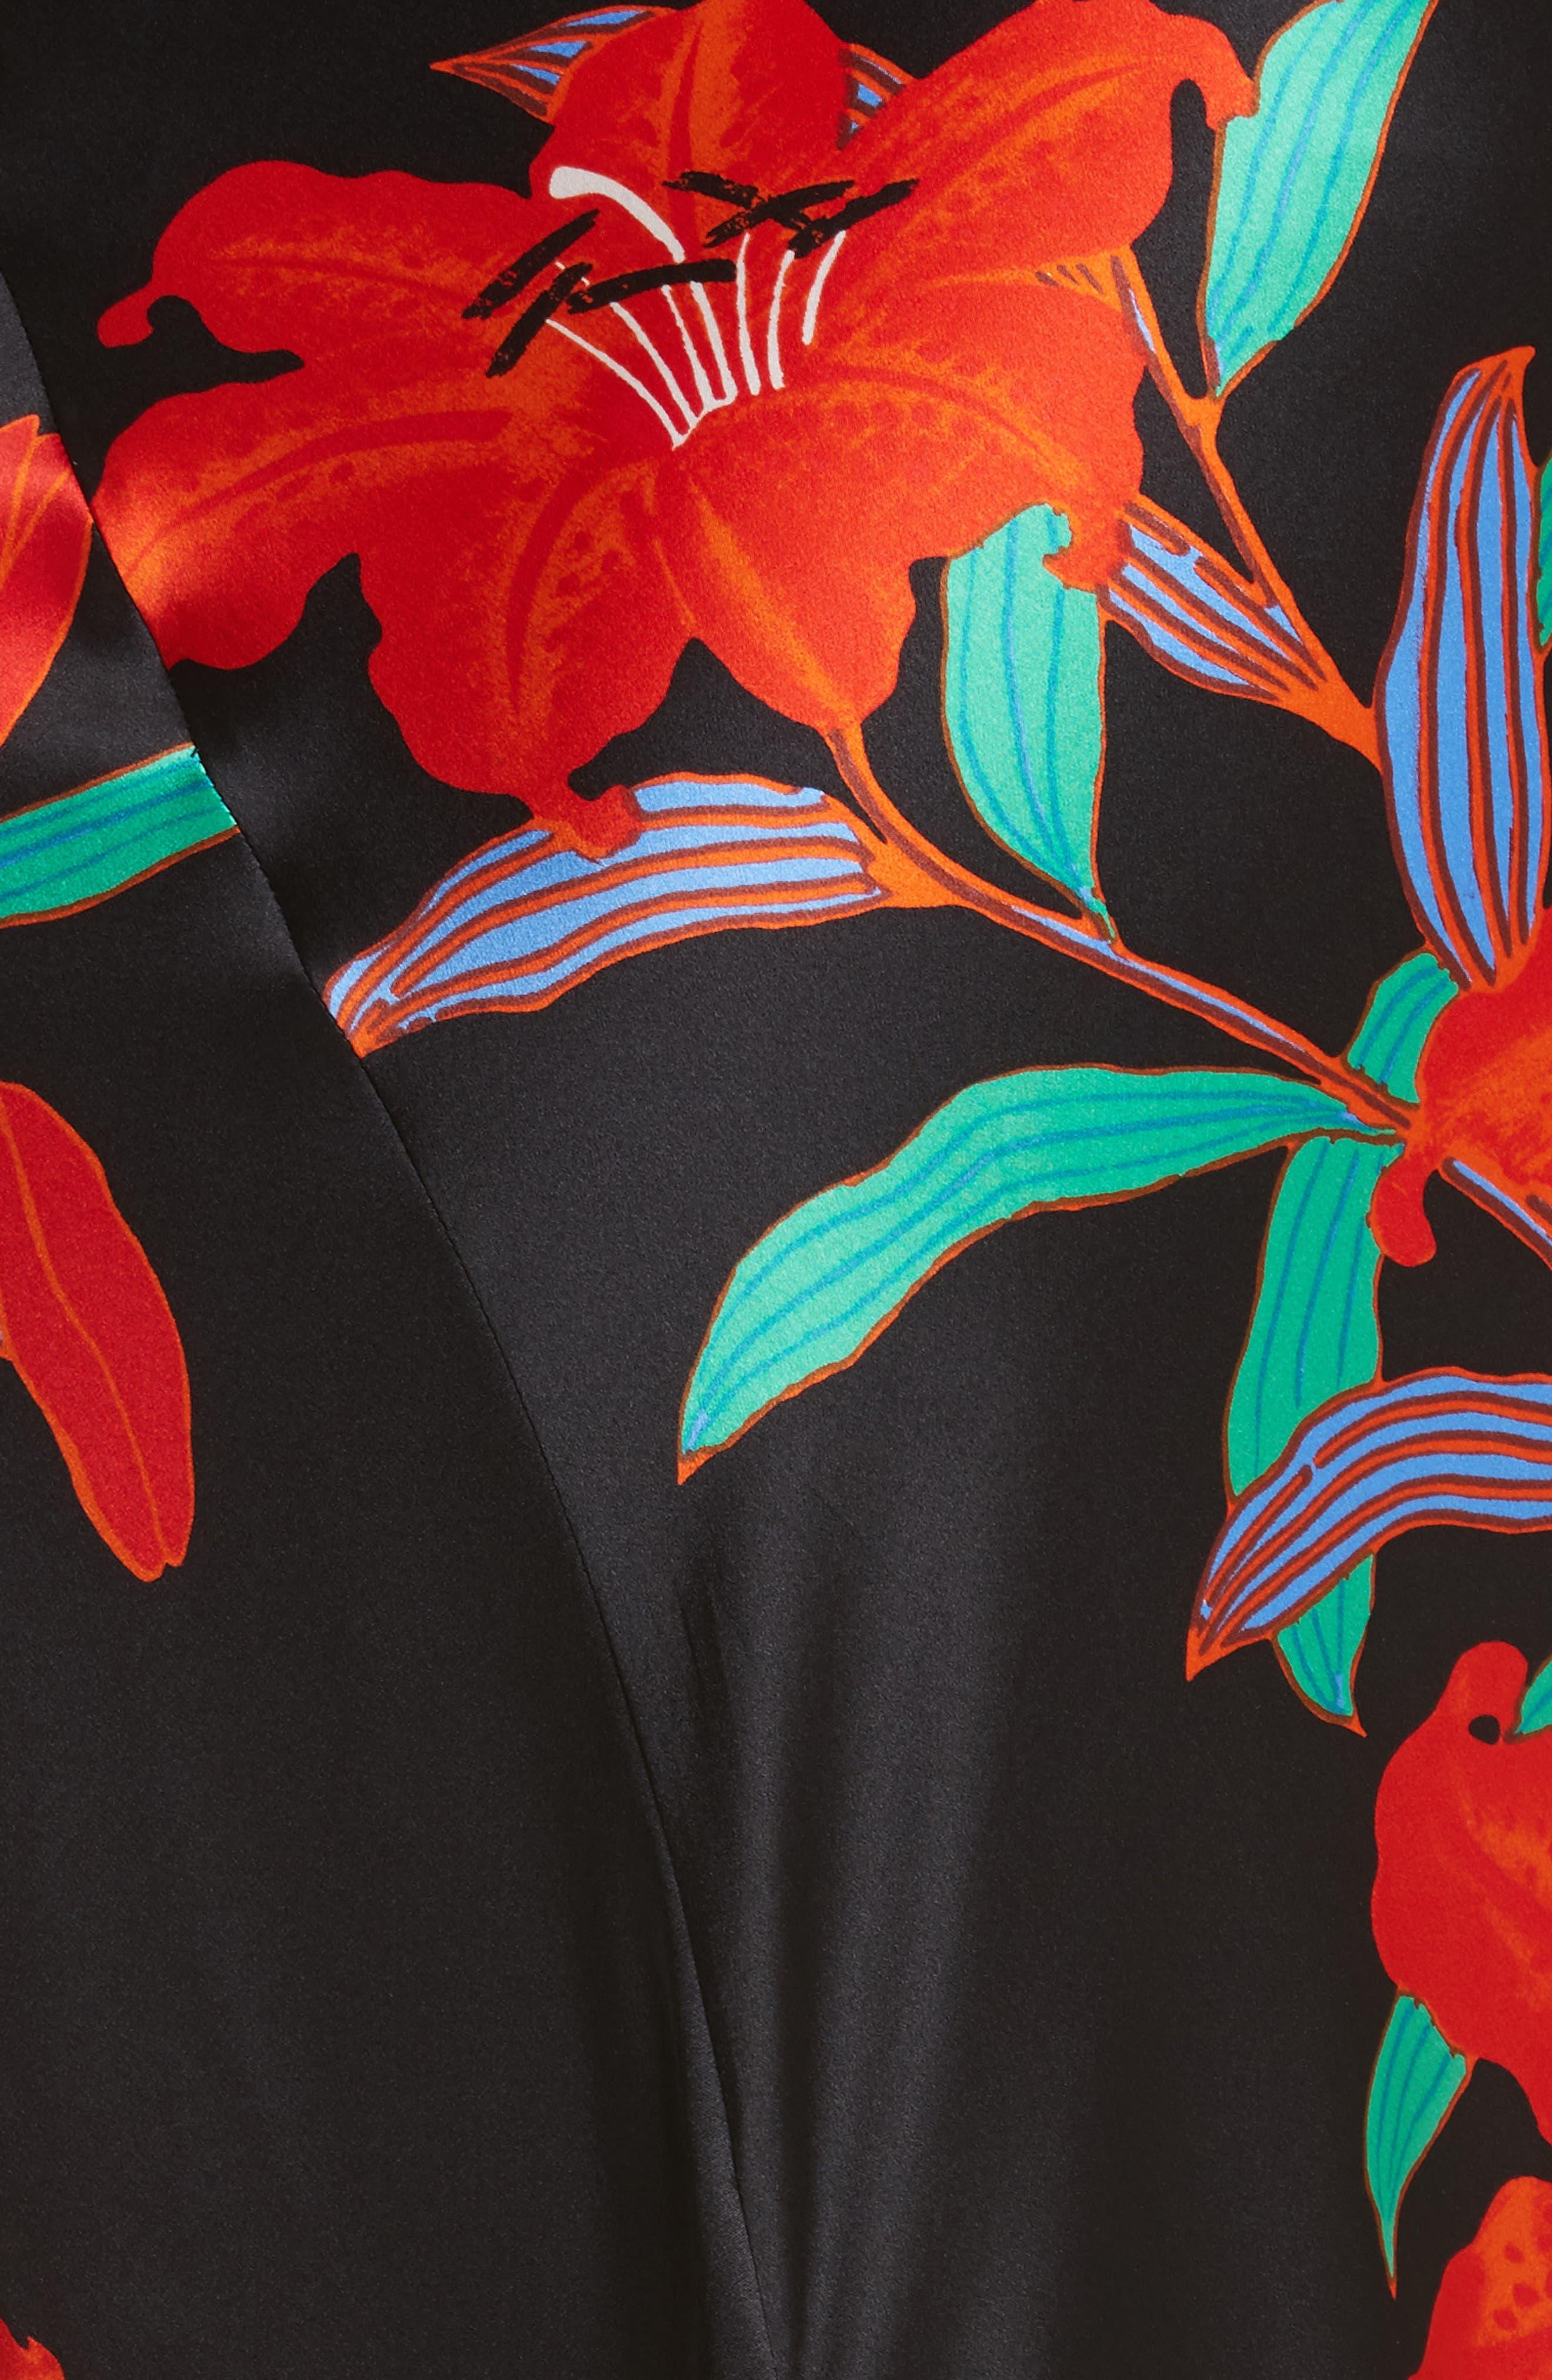 Diane von Furstenberg Asymmetrical Knotted Gown,                             Alternate thumbnail 5, color,                             Argos Black